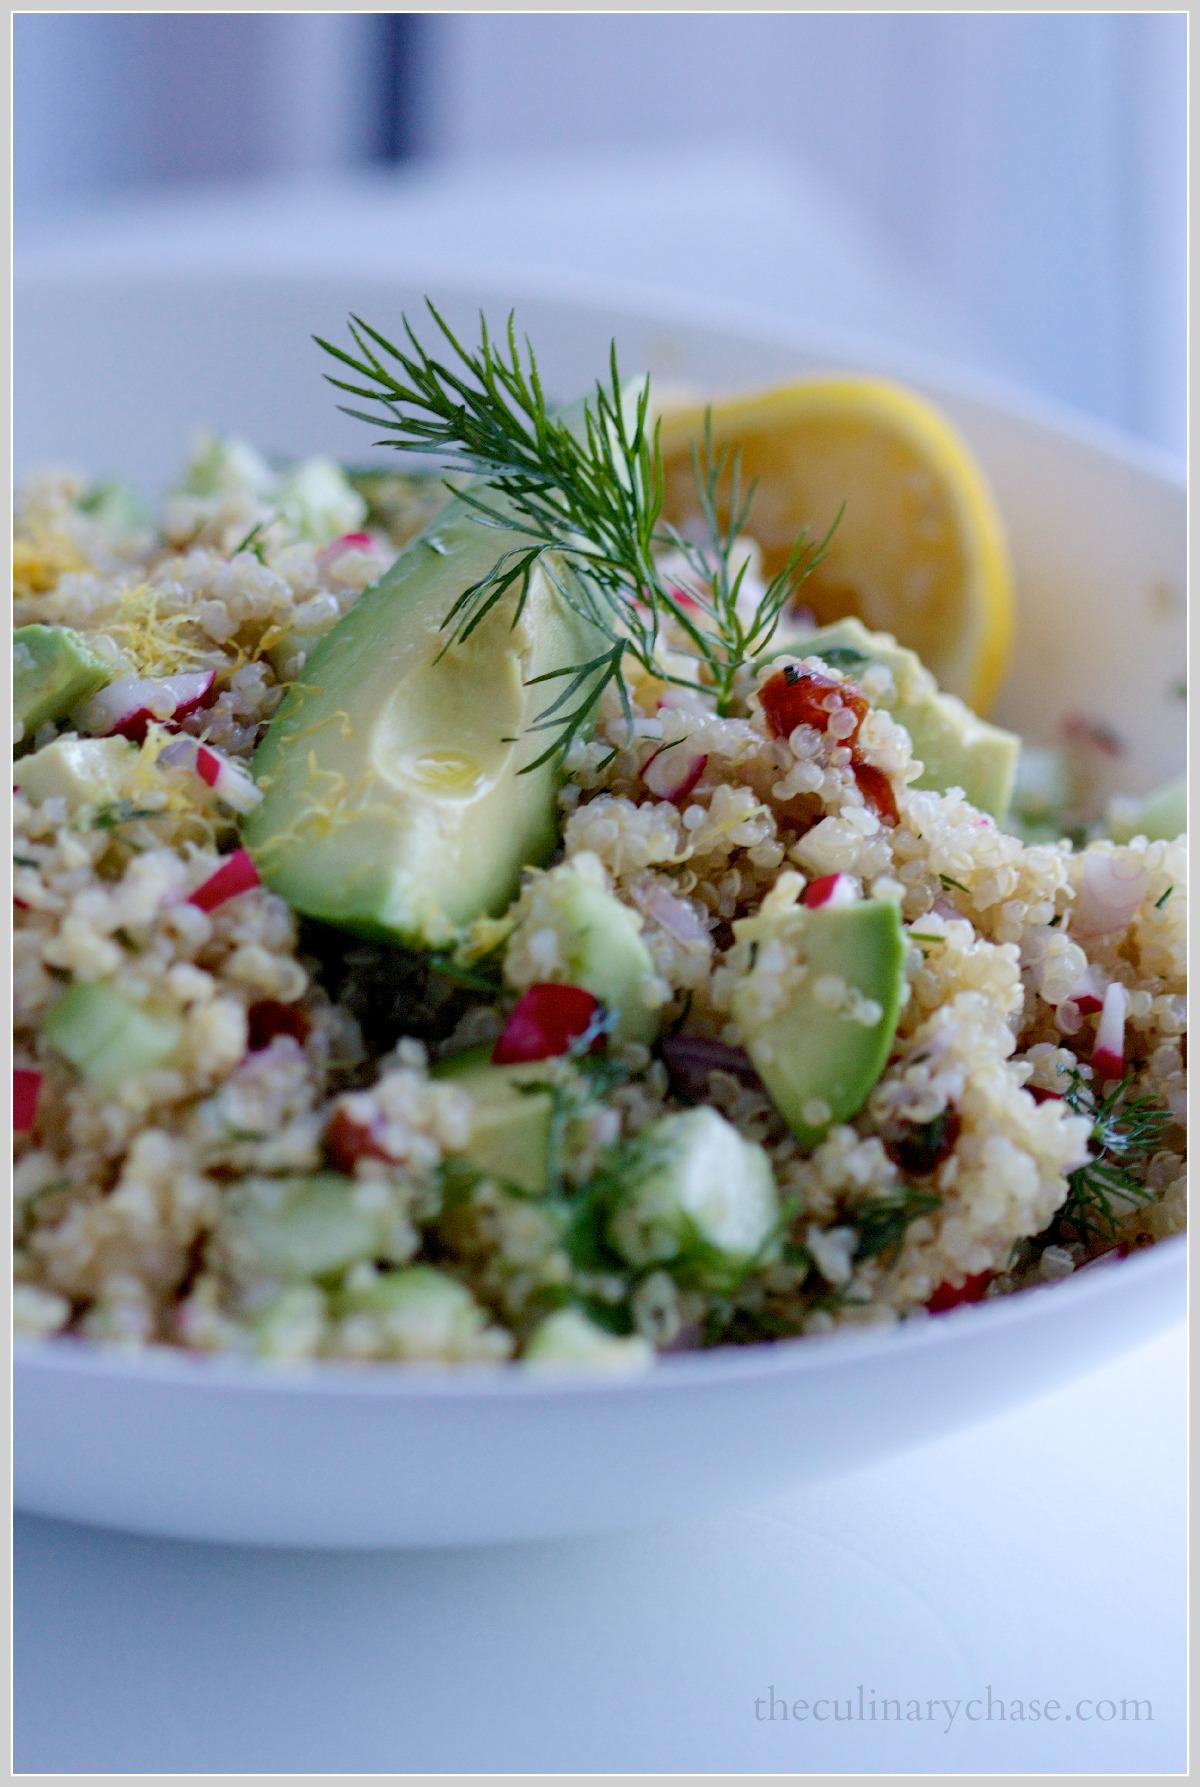 quinoa salad with radish, dill & avocado by The Culinary Chase